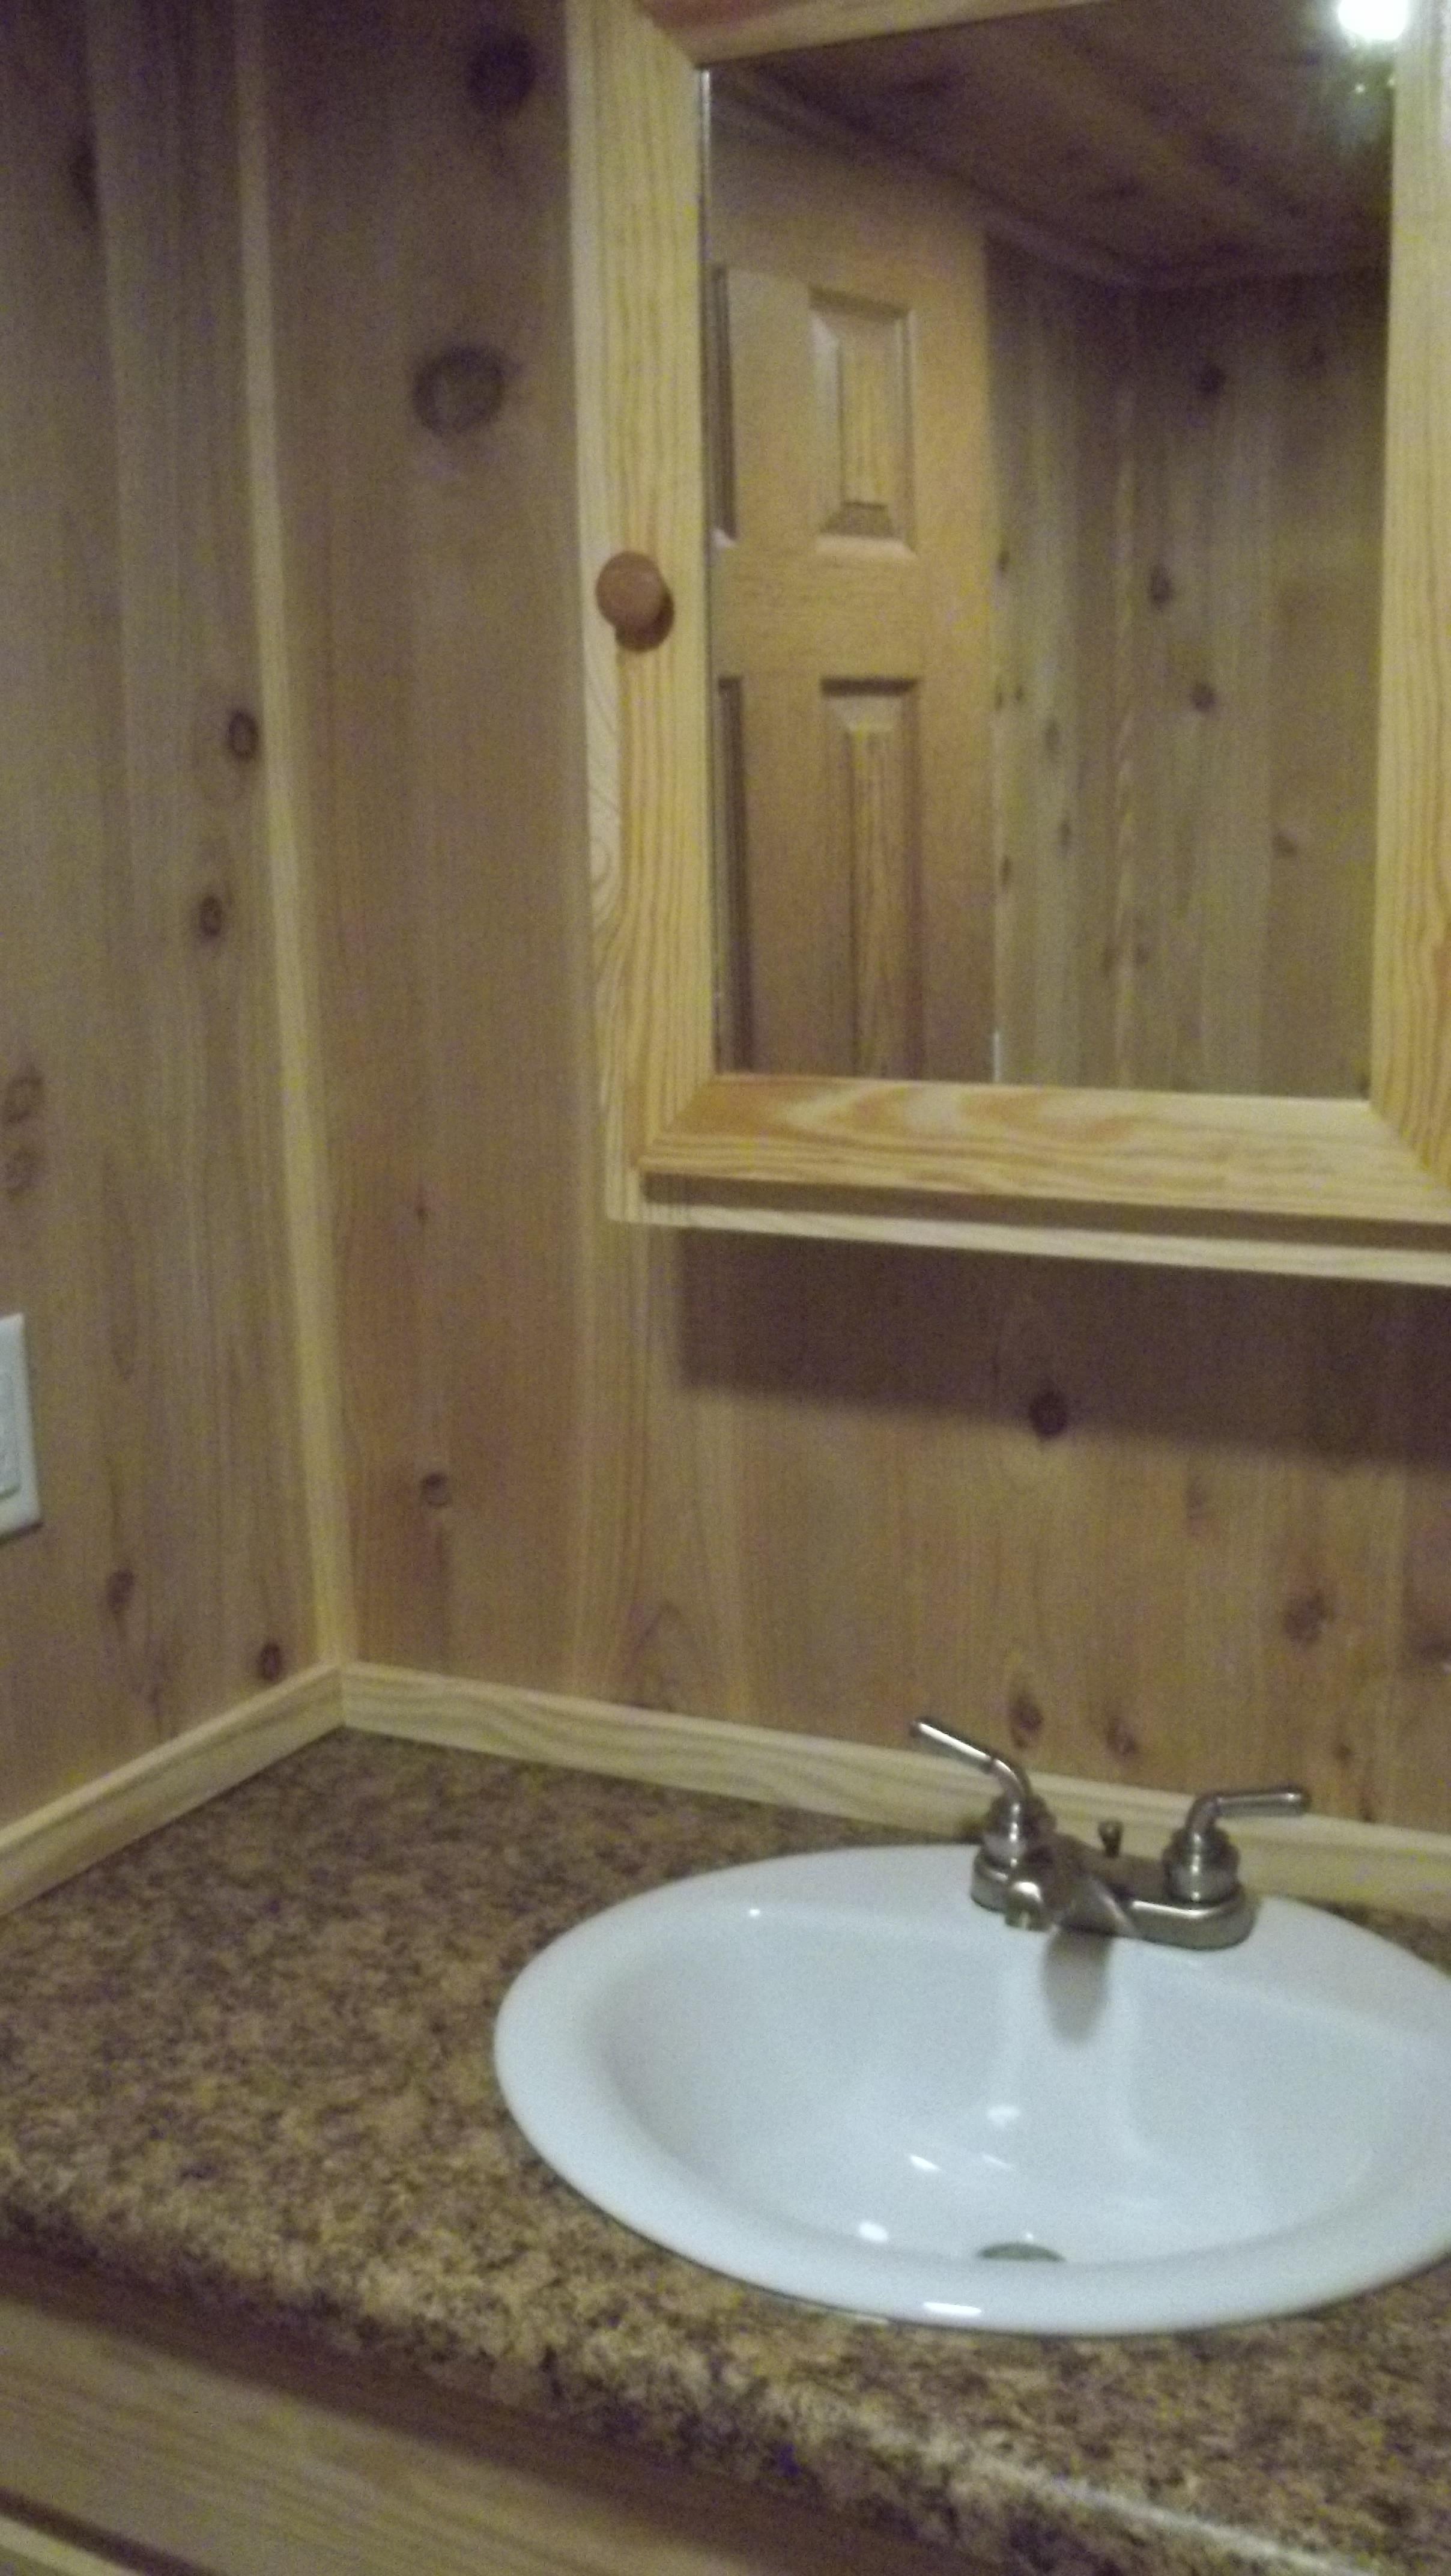 P4bathroom2